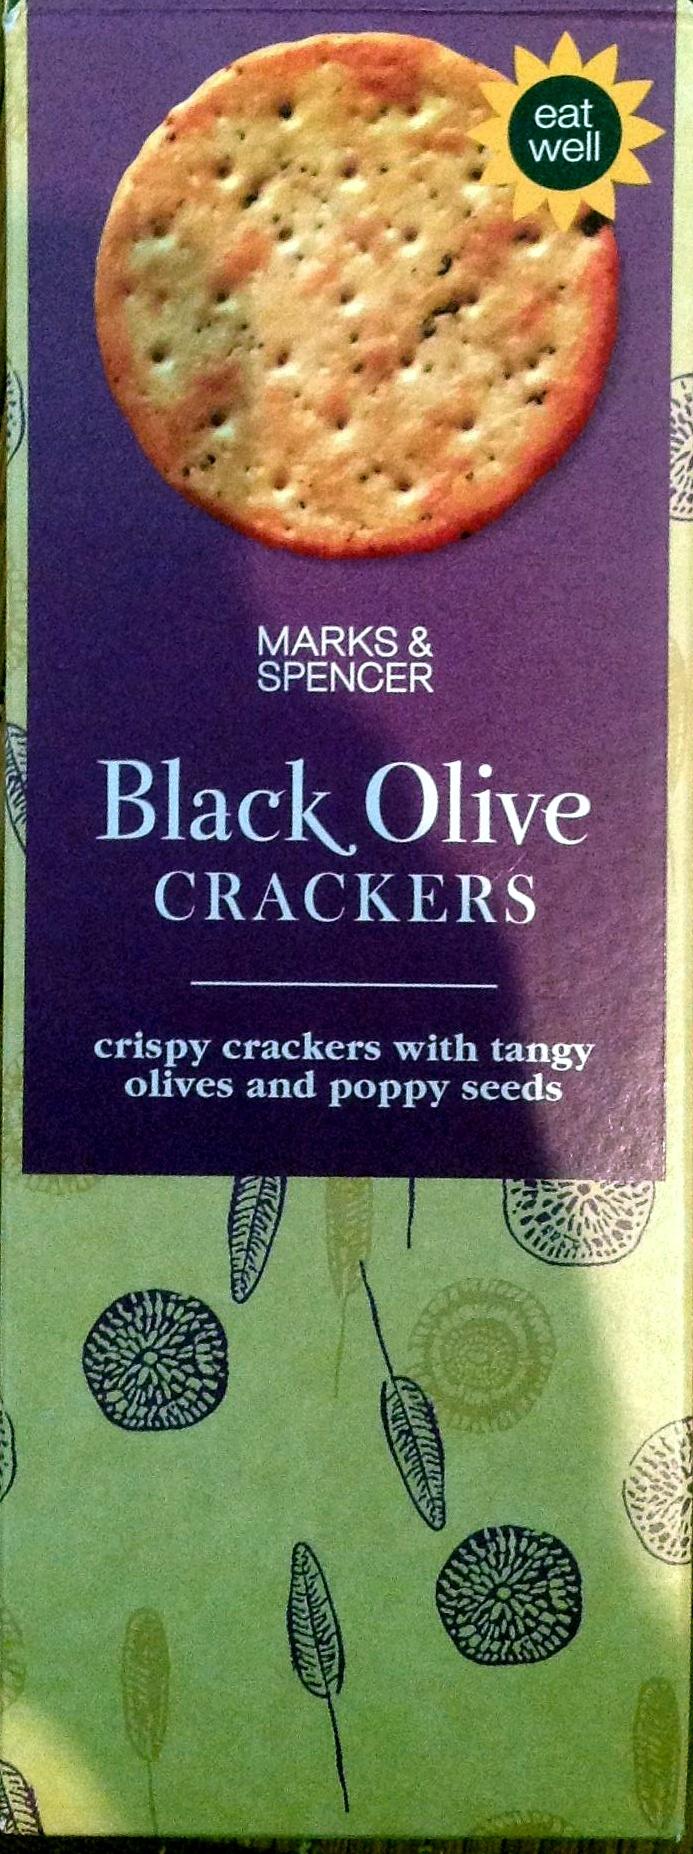 Black Olive crackers - Produit